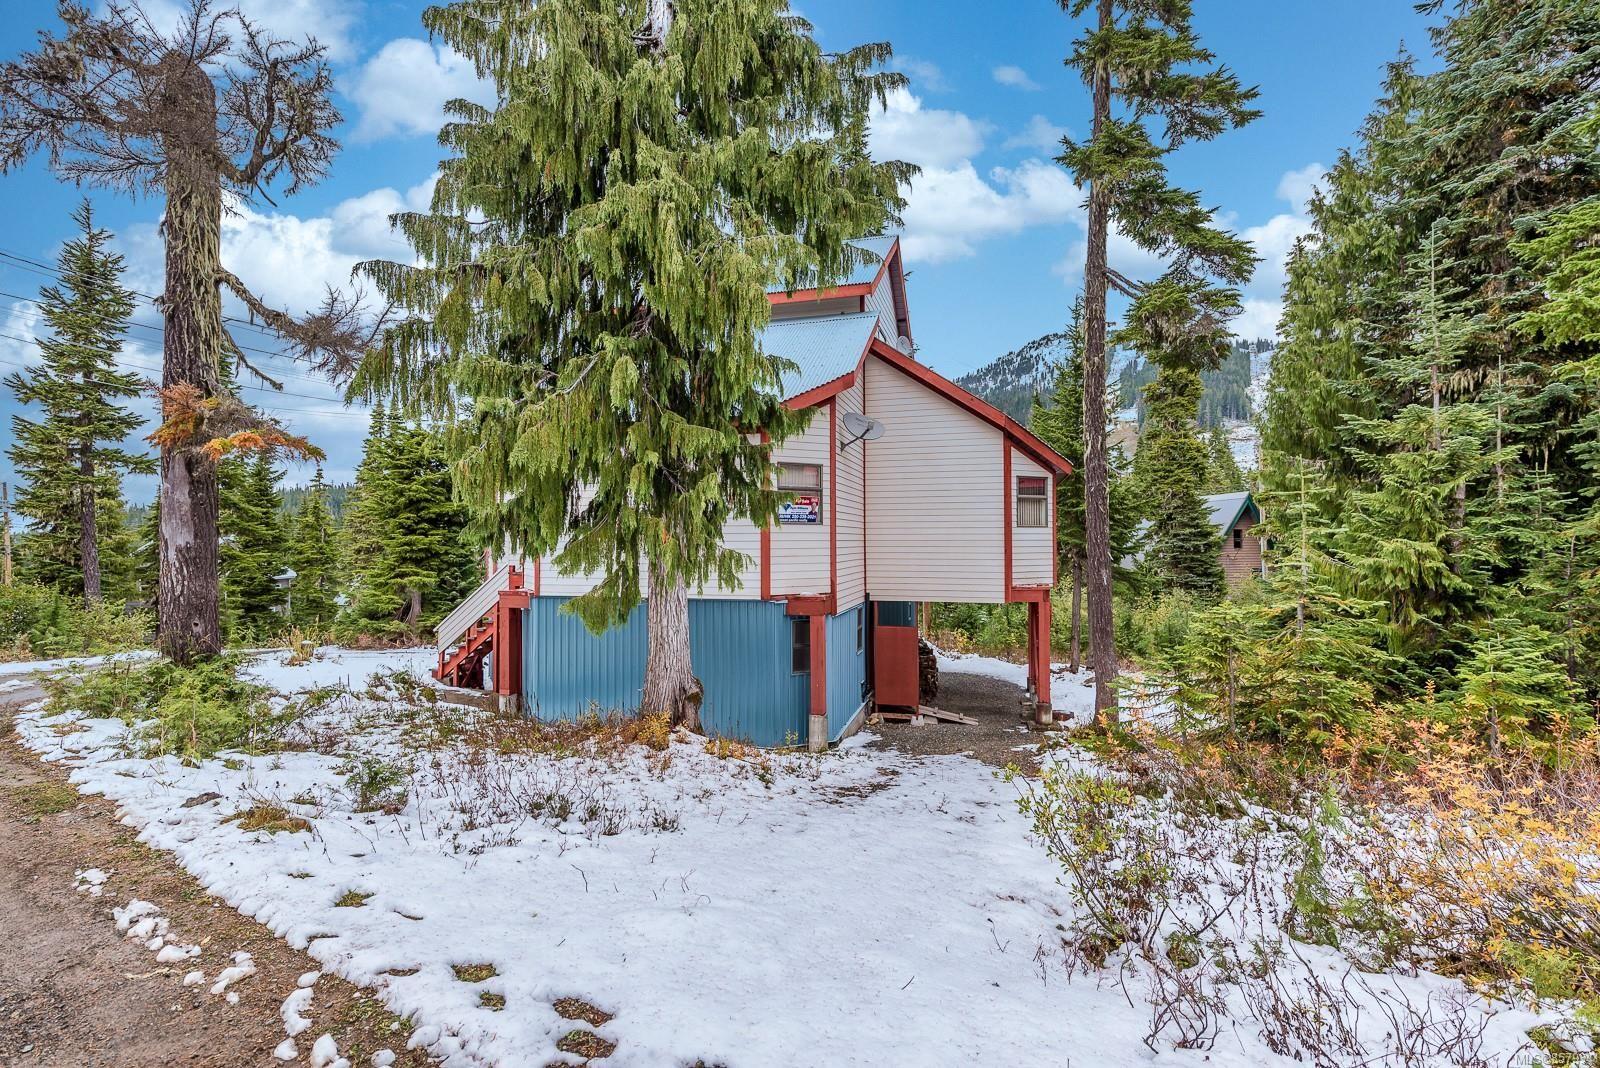 Photo 28: Photos: 998 STRATA Way in : CV Mt Washington House for sale (Comox Valley)  : MLS®# 857934